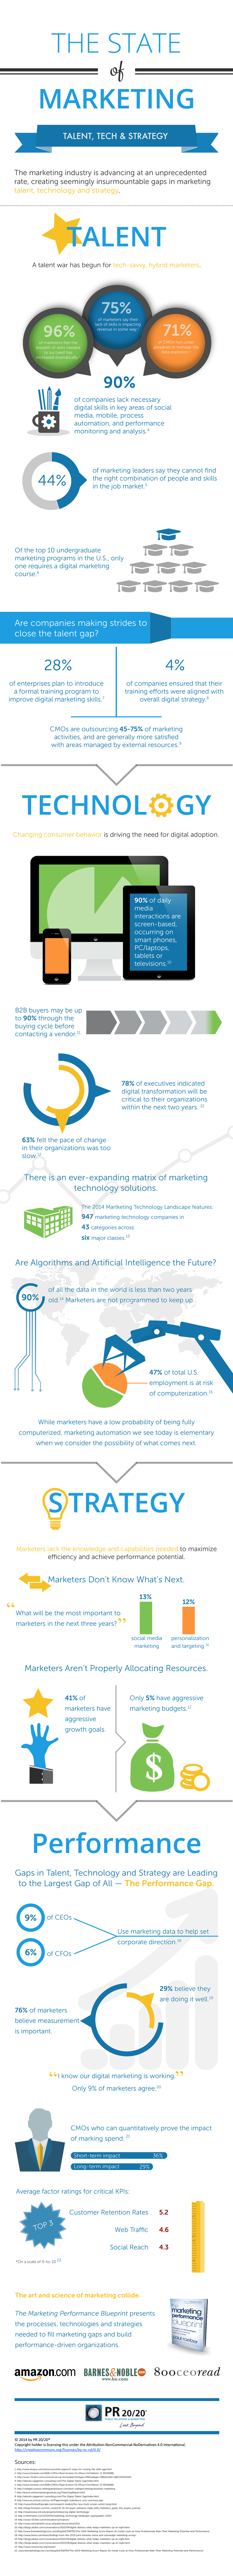 PR_B2-Infographic-V4-01.jpg